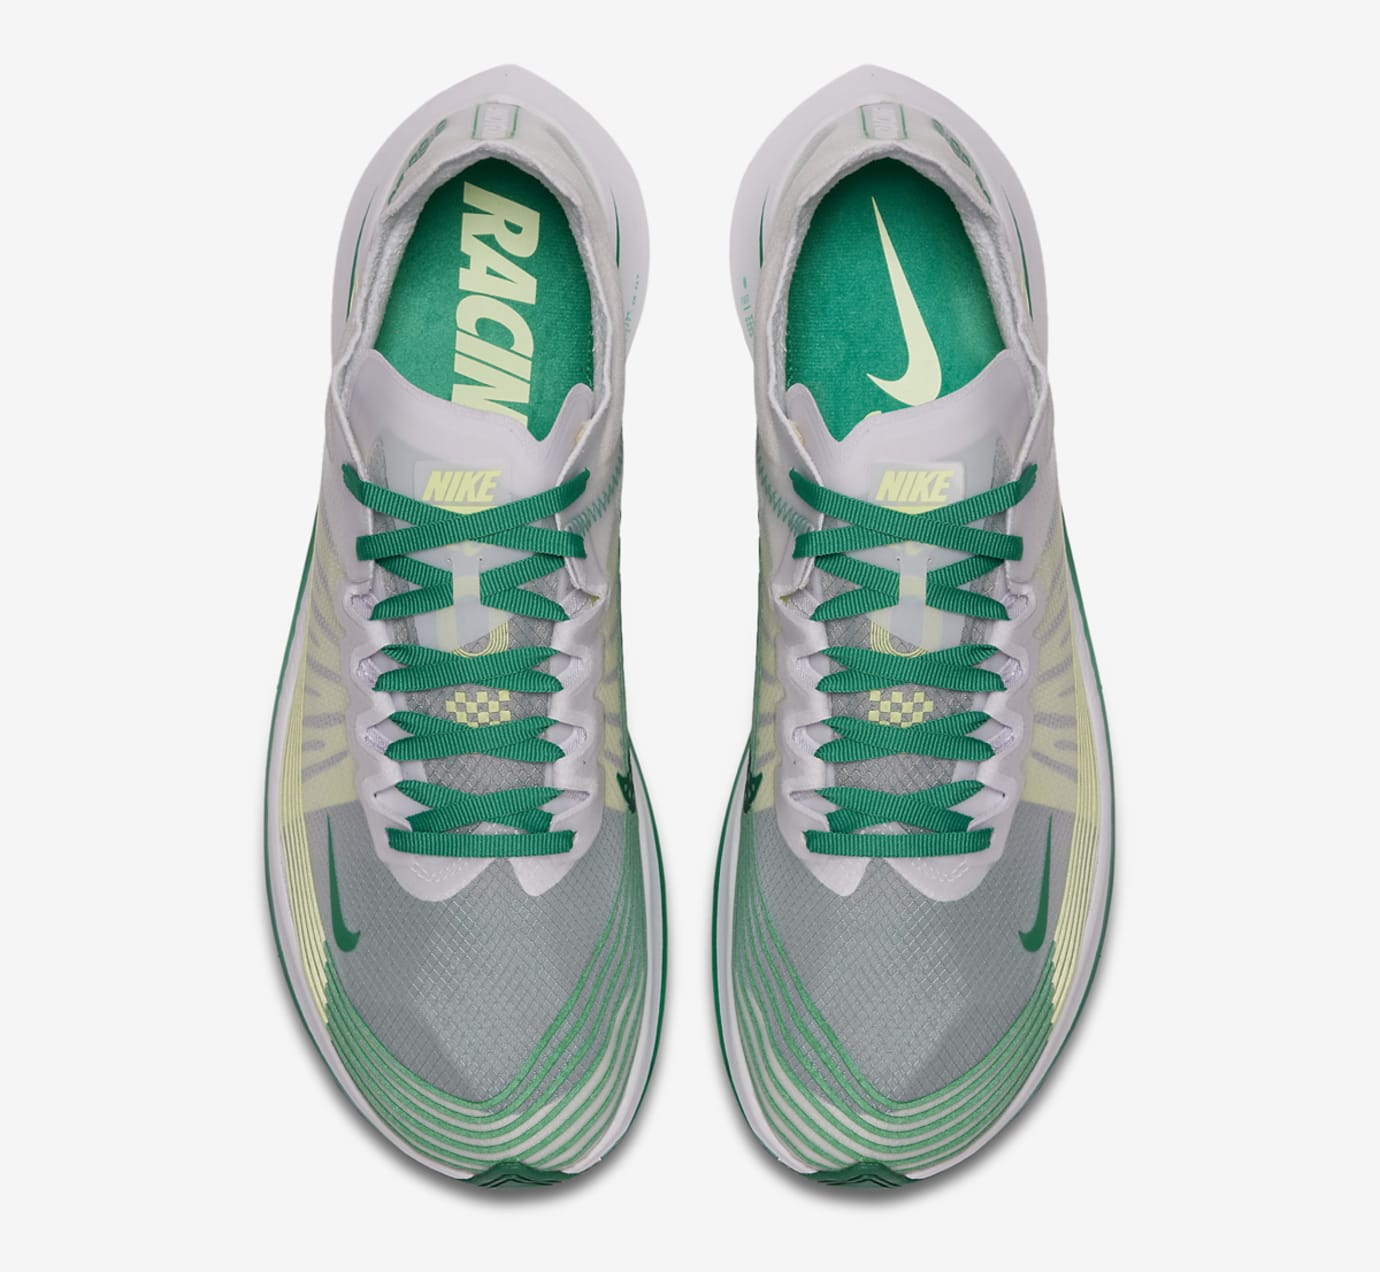 Image via Nike Nike Zoom Fly SP White Lucid Green AJ9282-101 Top 1608f6f9ca4e